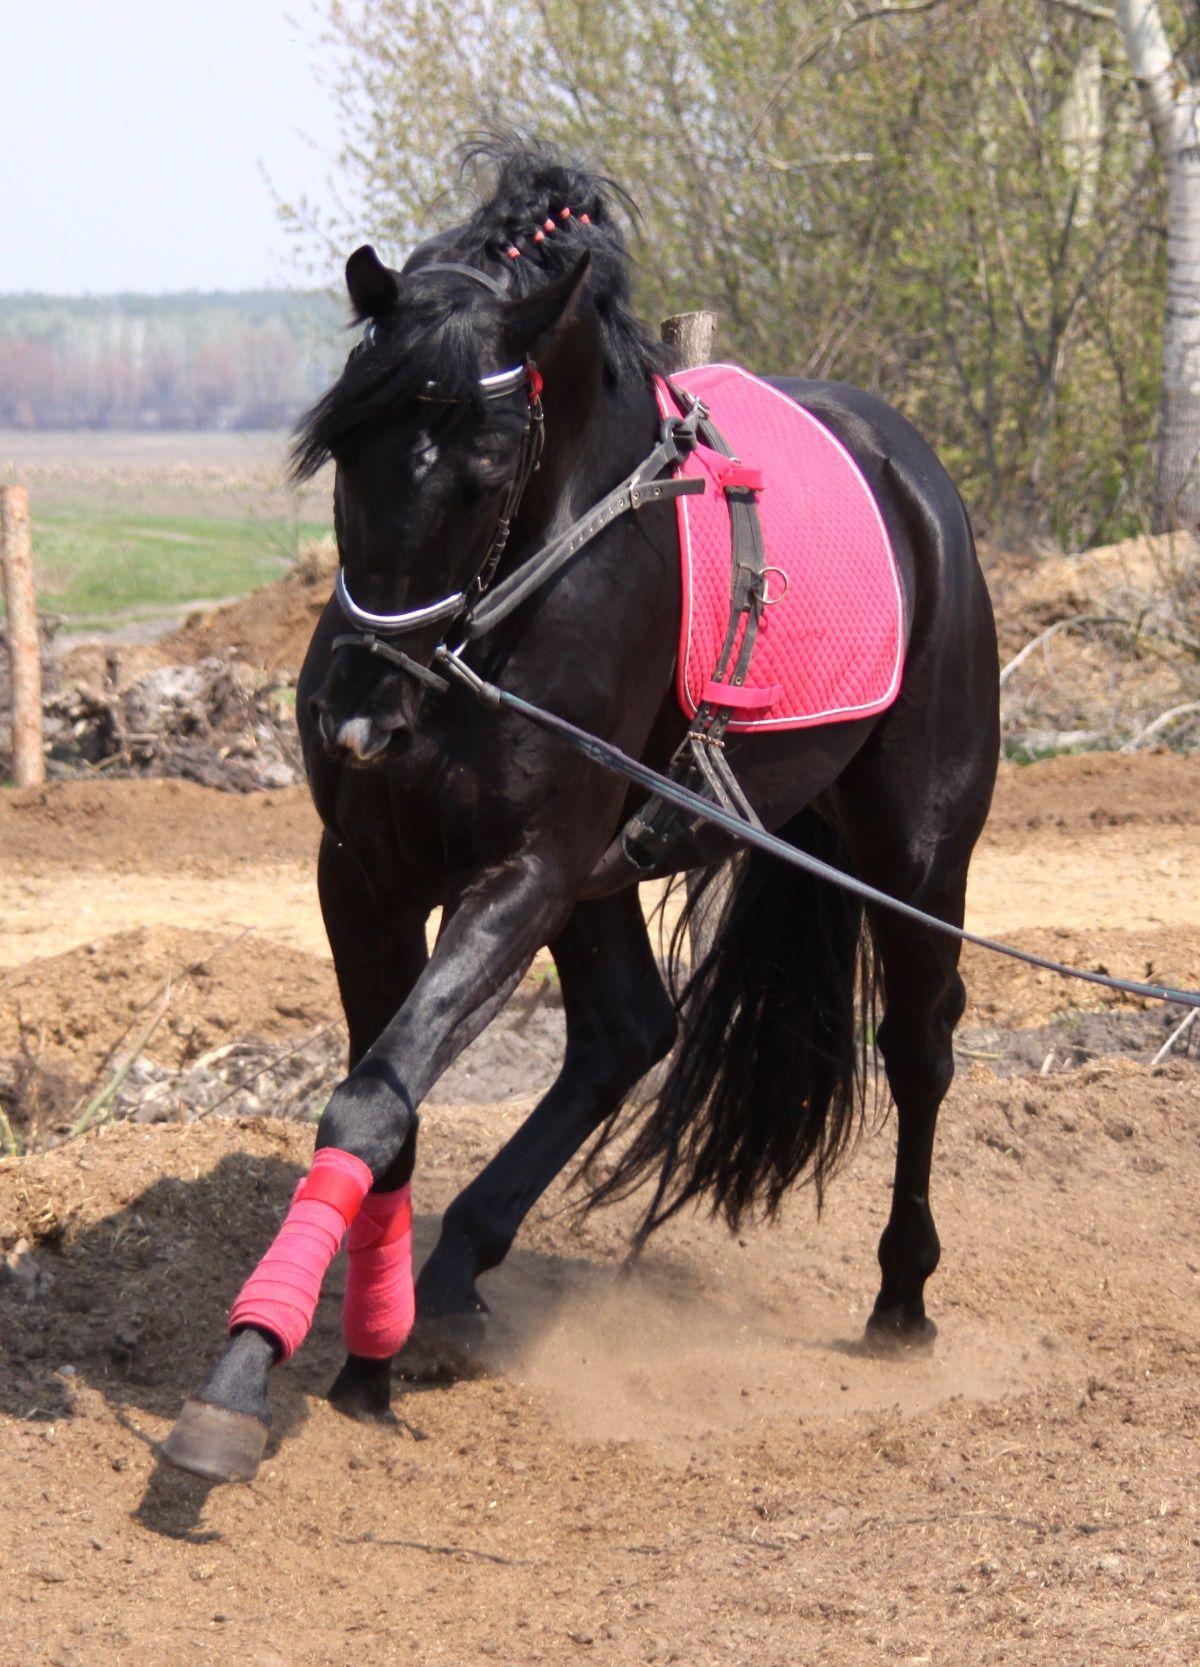 Workout Www Thewarmbloodhorse Com Horses Show Horses Horse Life